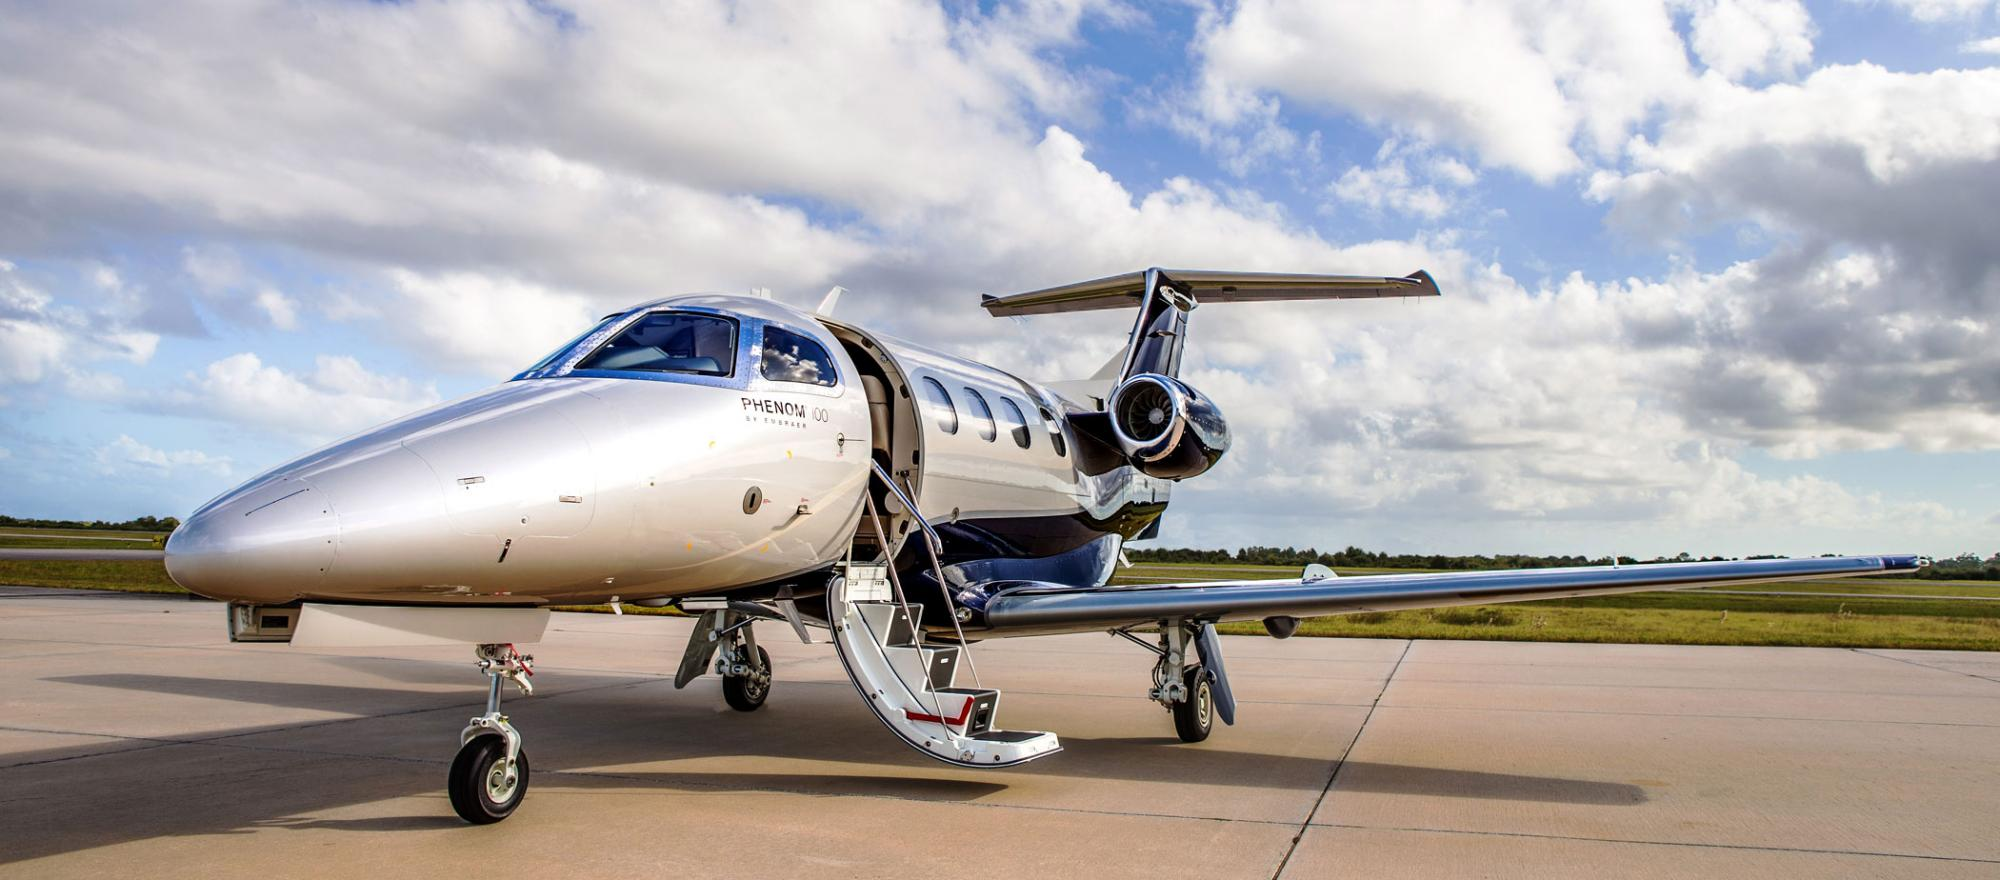 Embraer EMB-500 Phenom 100 charter services